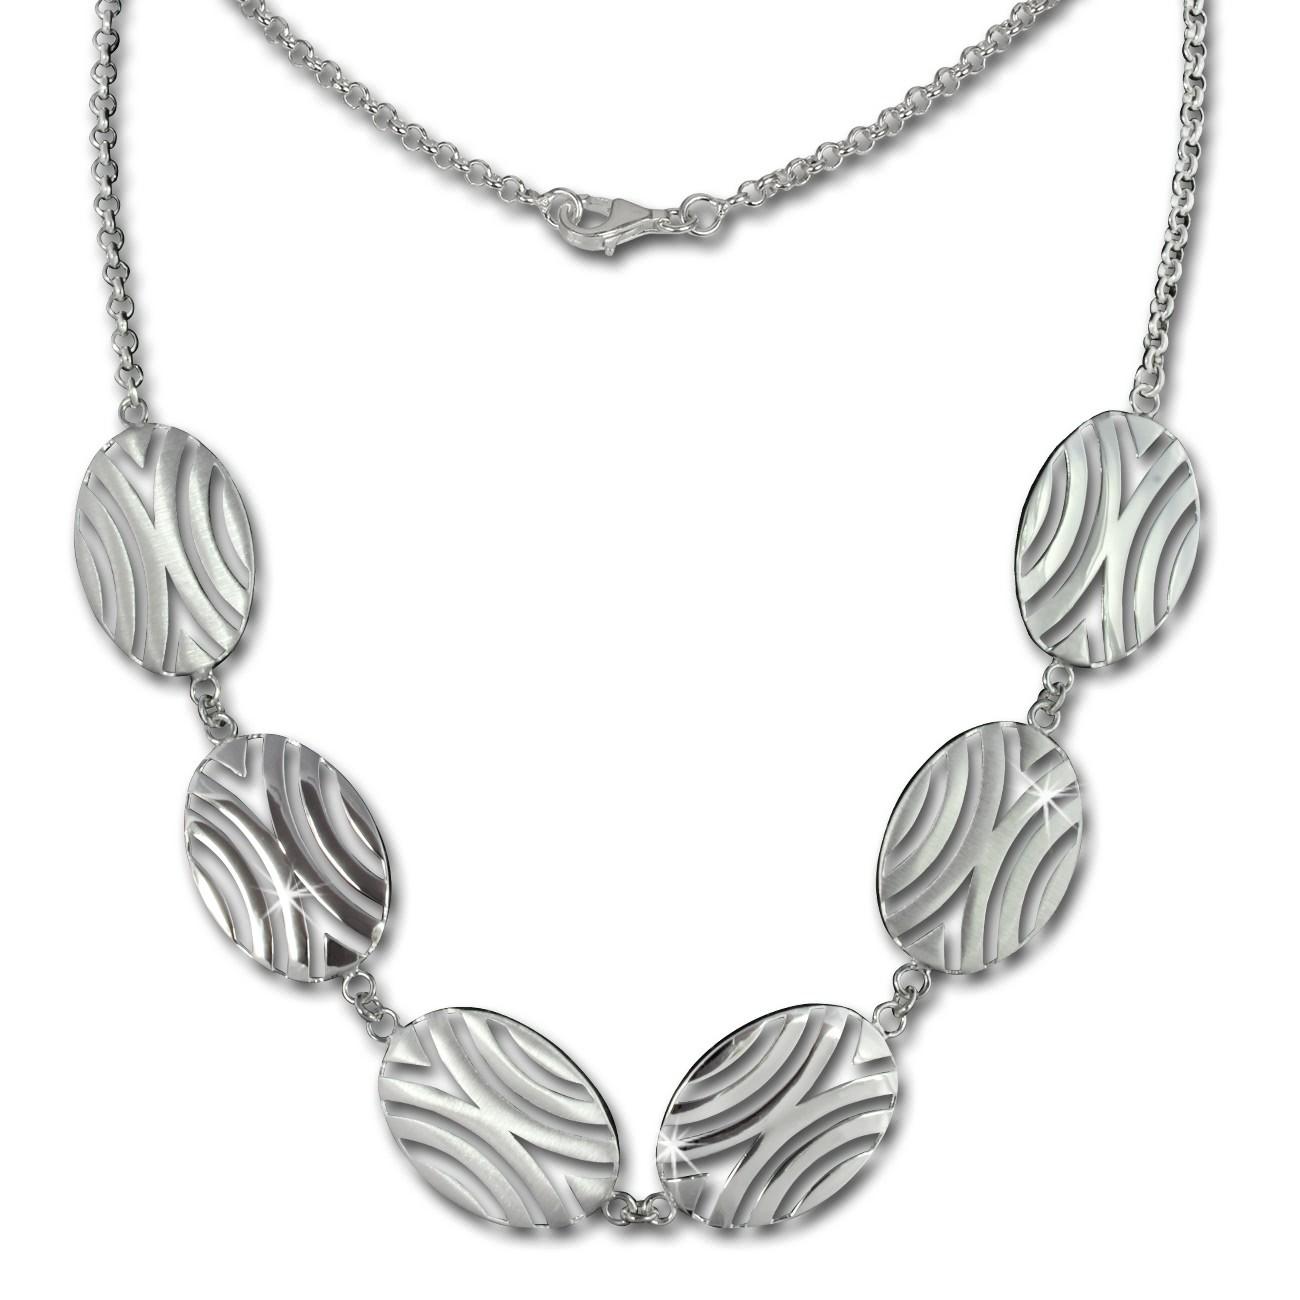 SilberDream Collier Afrika 925 Sterling Silber 45cm Halskette SDK417